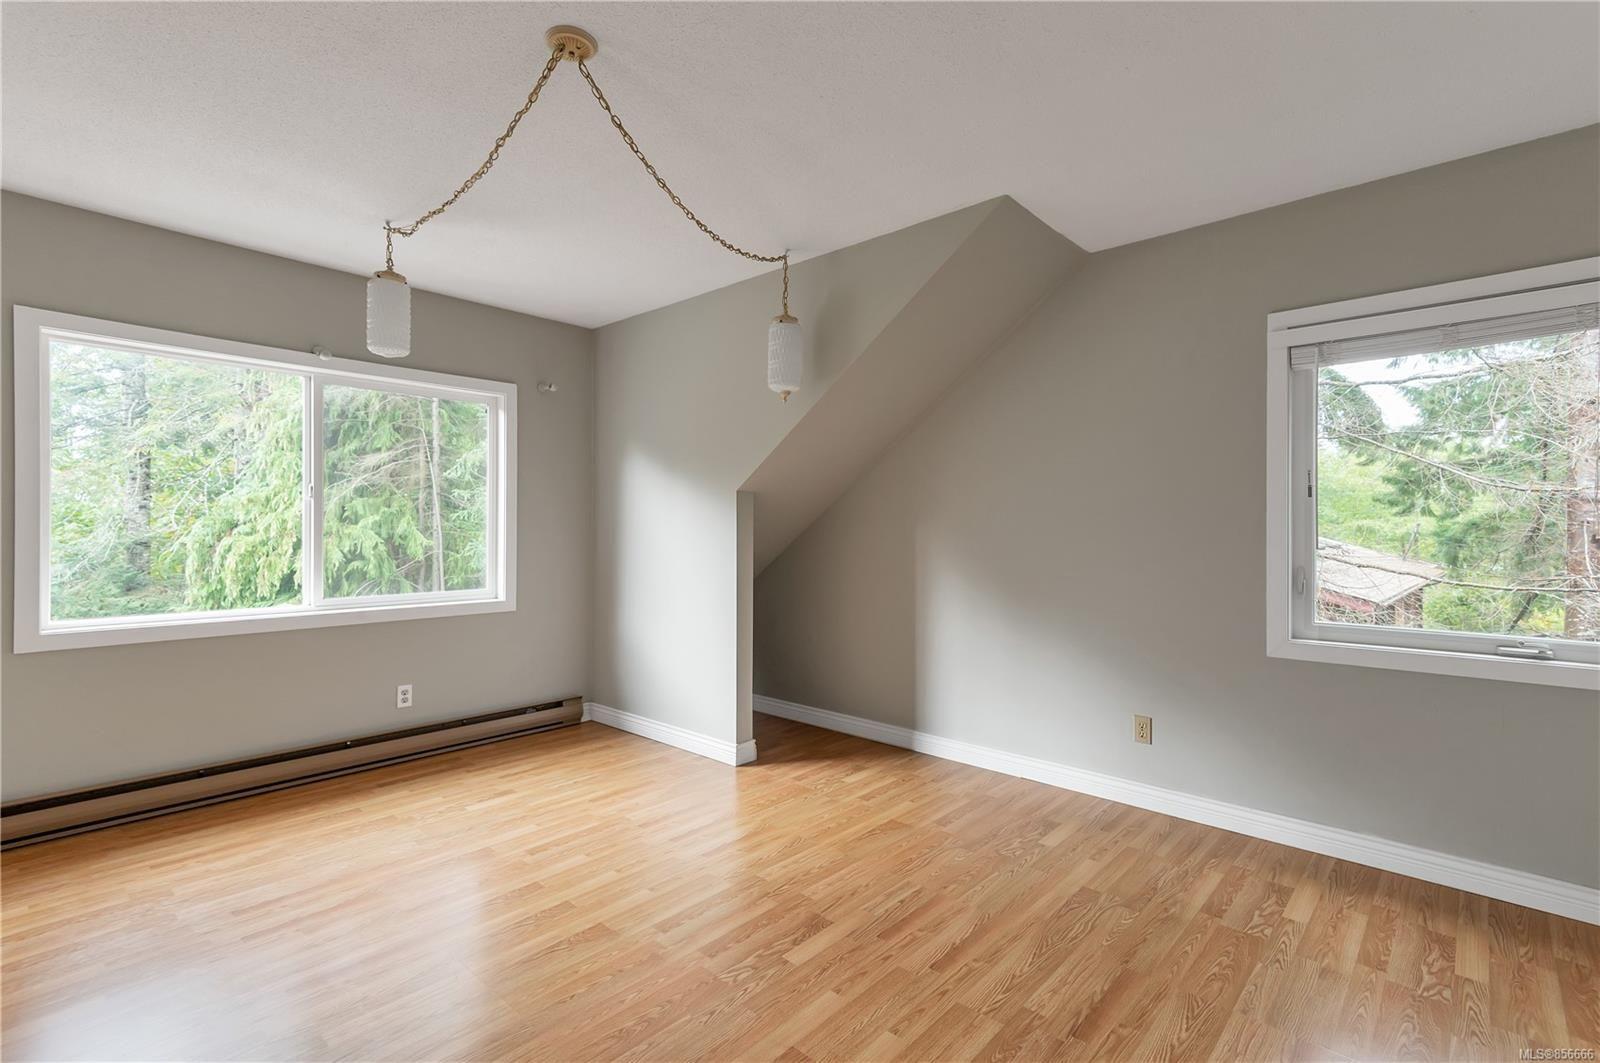 Photo 35: Photos: 2468 Oakes Rd in : CV Merville Black Creek House for sale (Comox Valley)  : MLS®# 856666